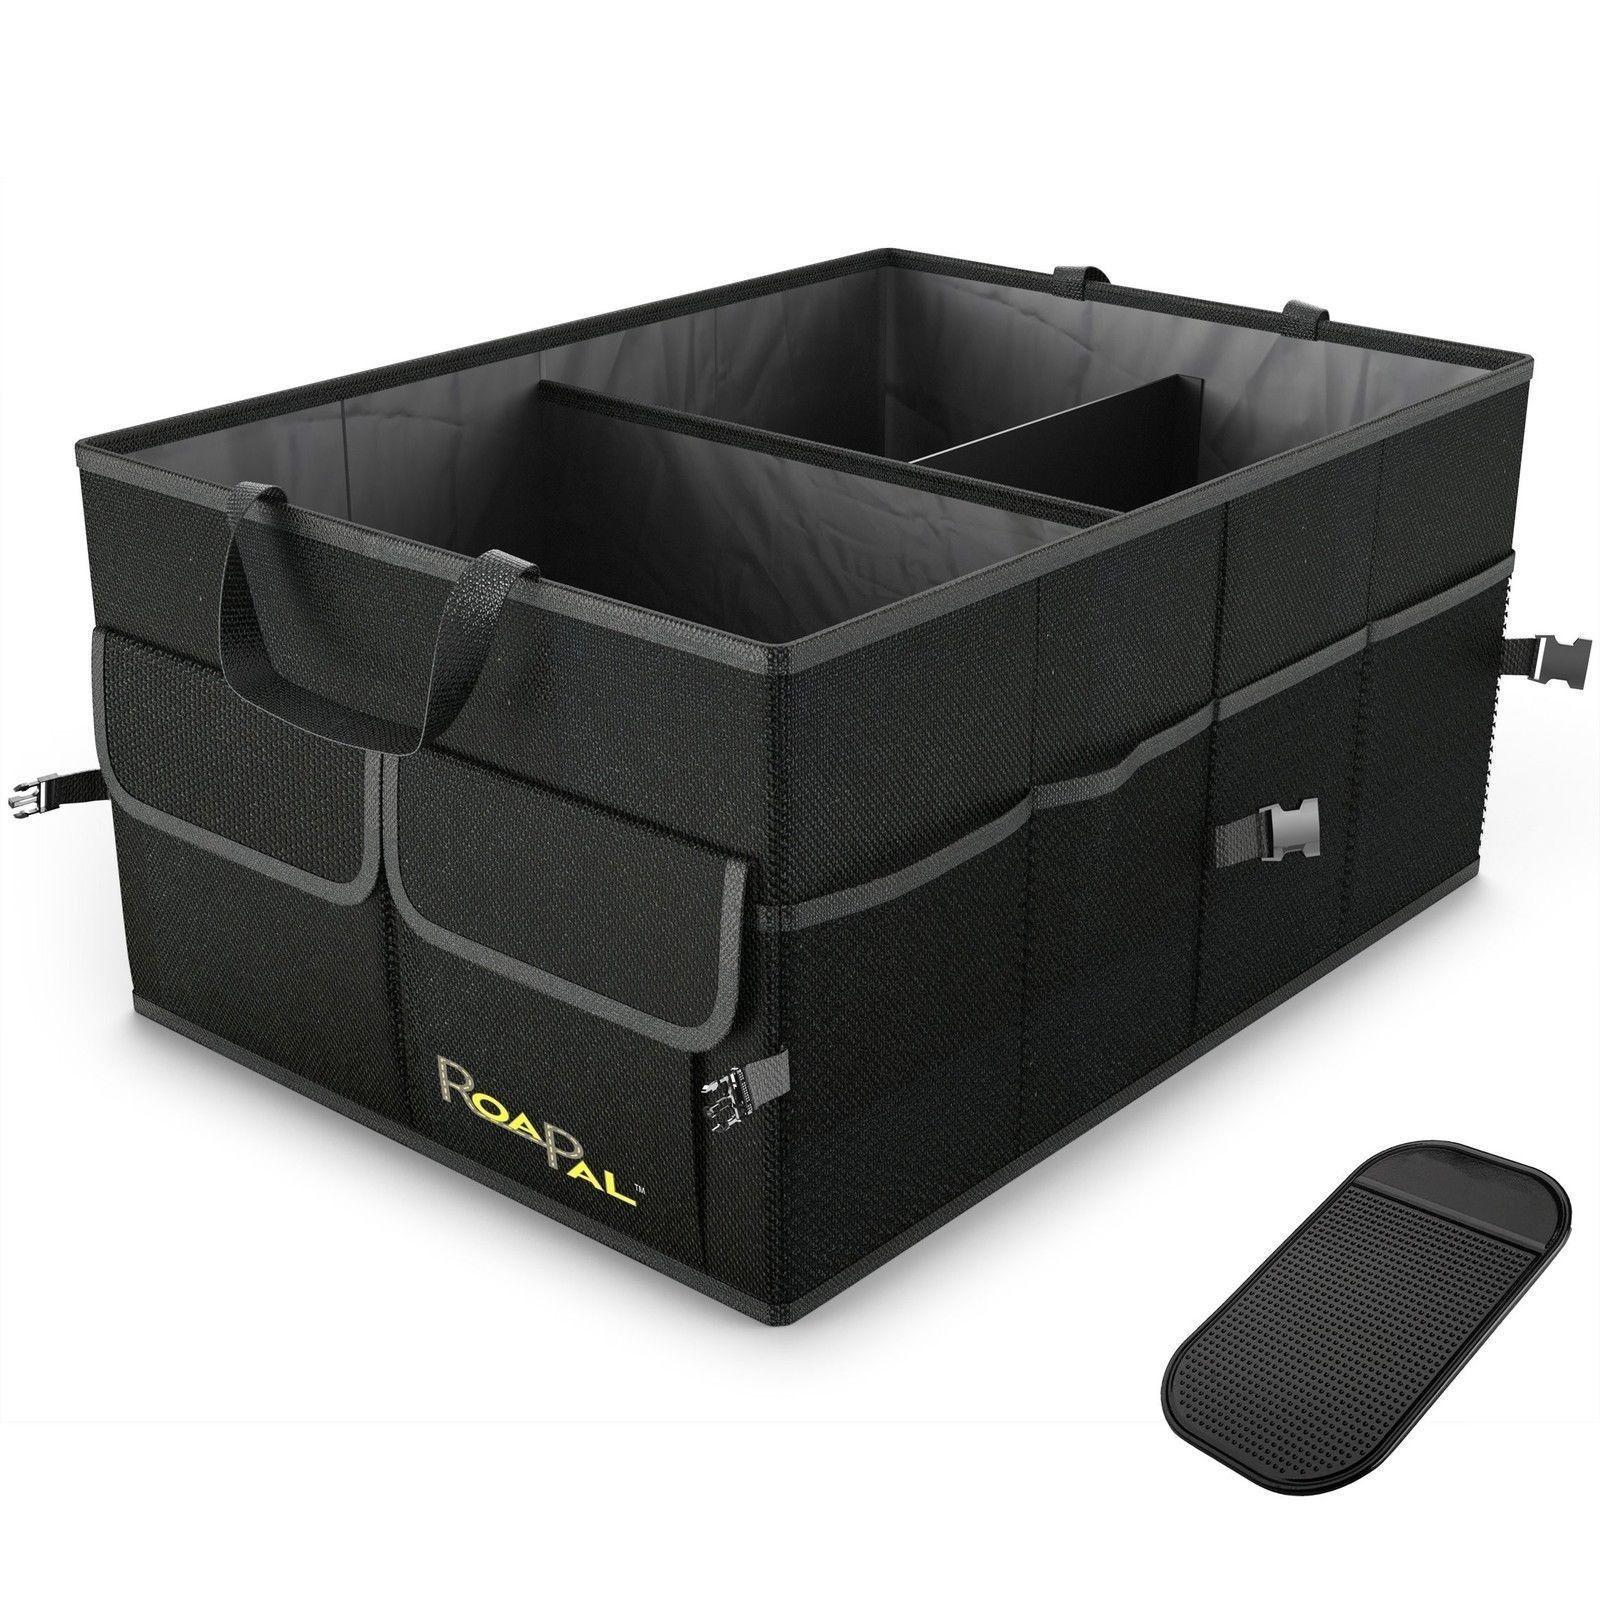 Car Trunk Organizer Foldable Storage Box Collapsible Auto Cargo Bag Portable SUV